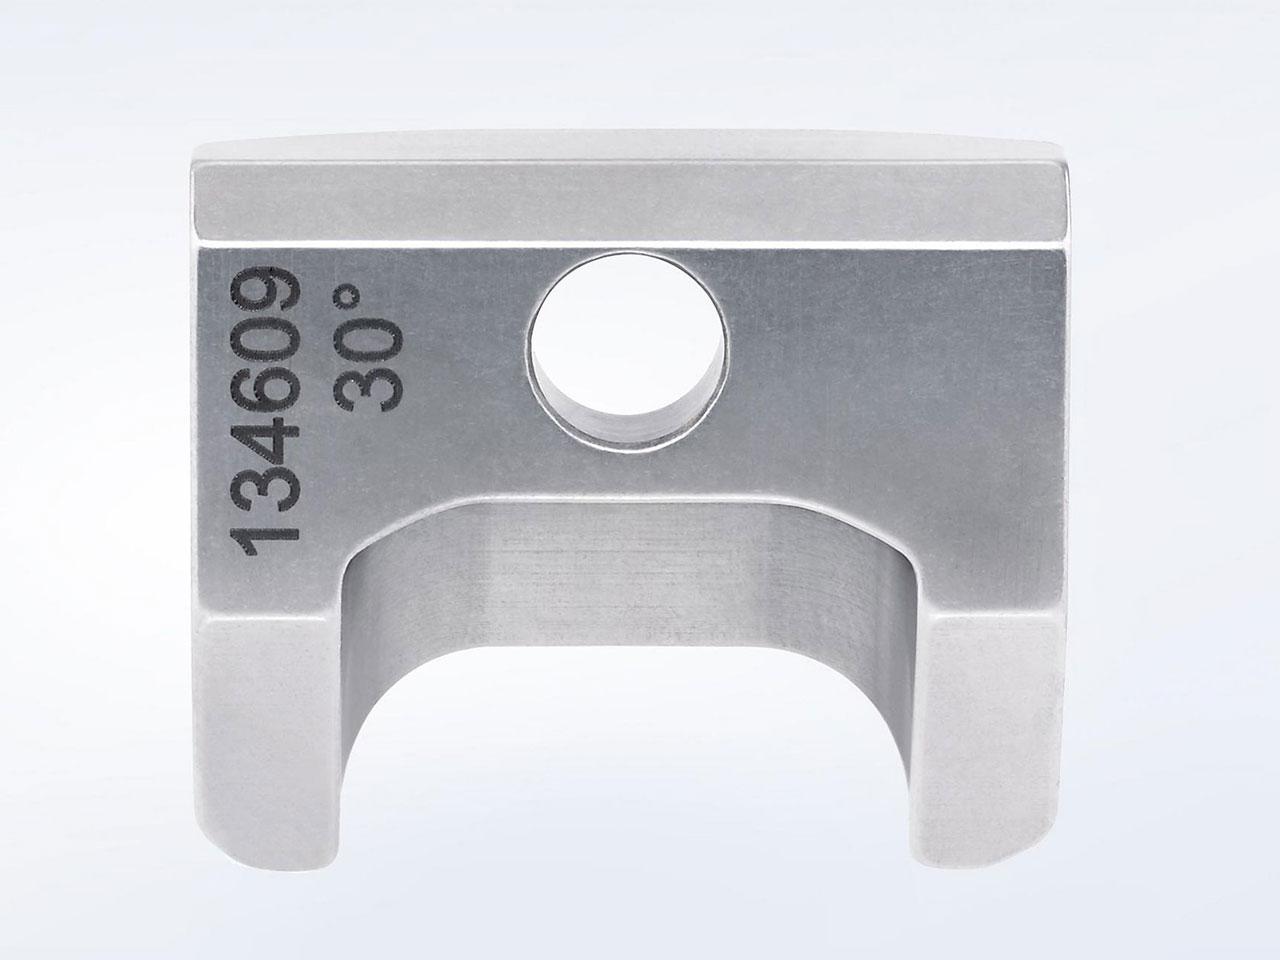 Schweisskantenformer TKF 700 Gegenhalter 30°